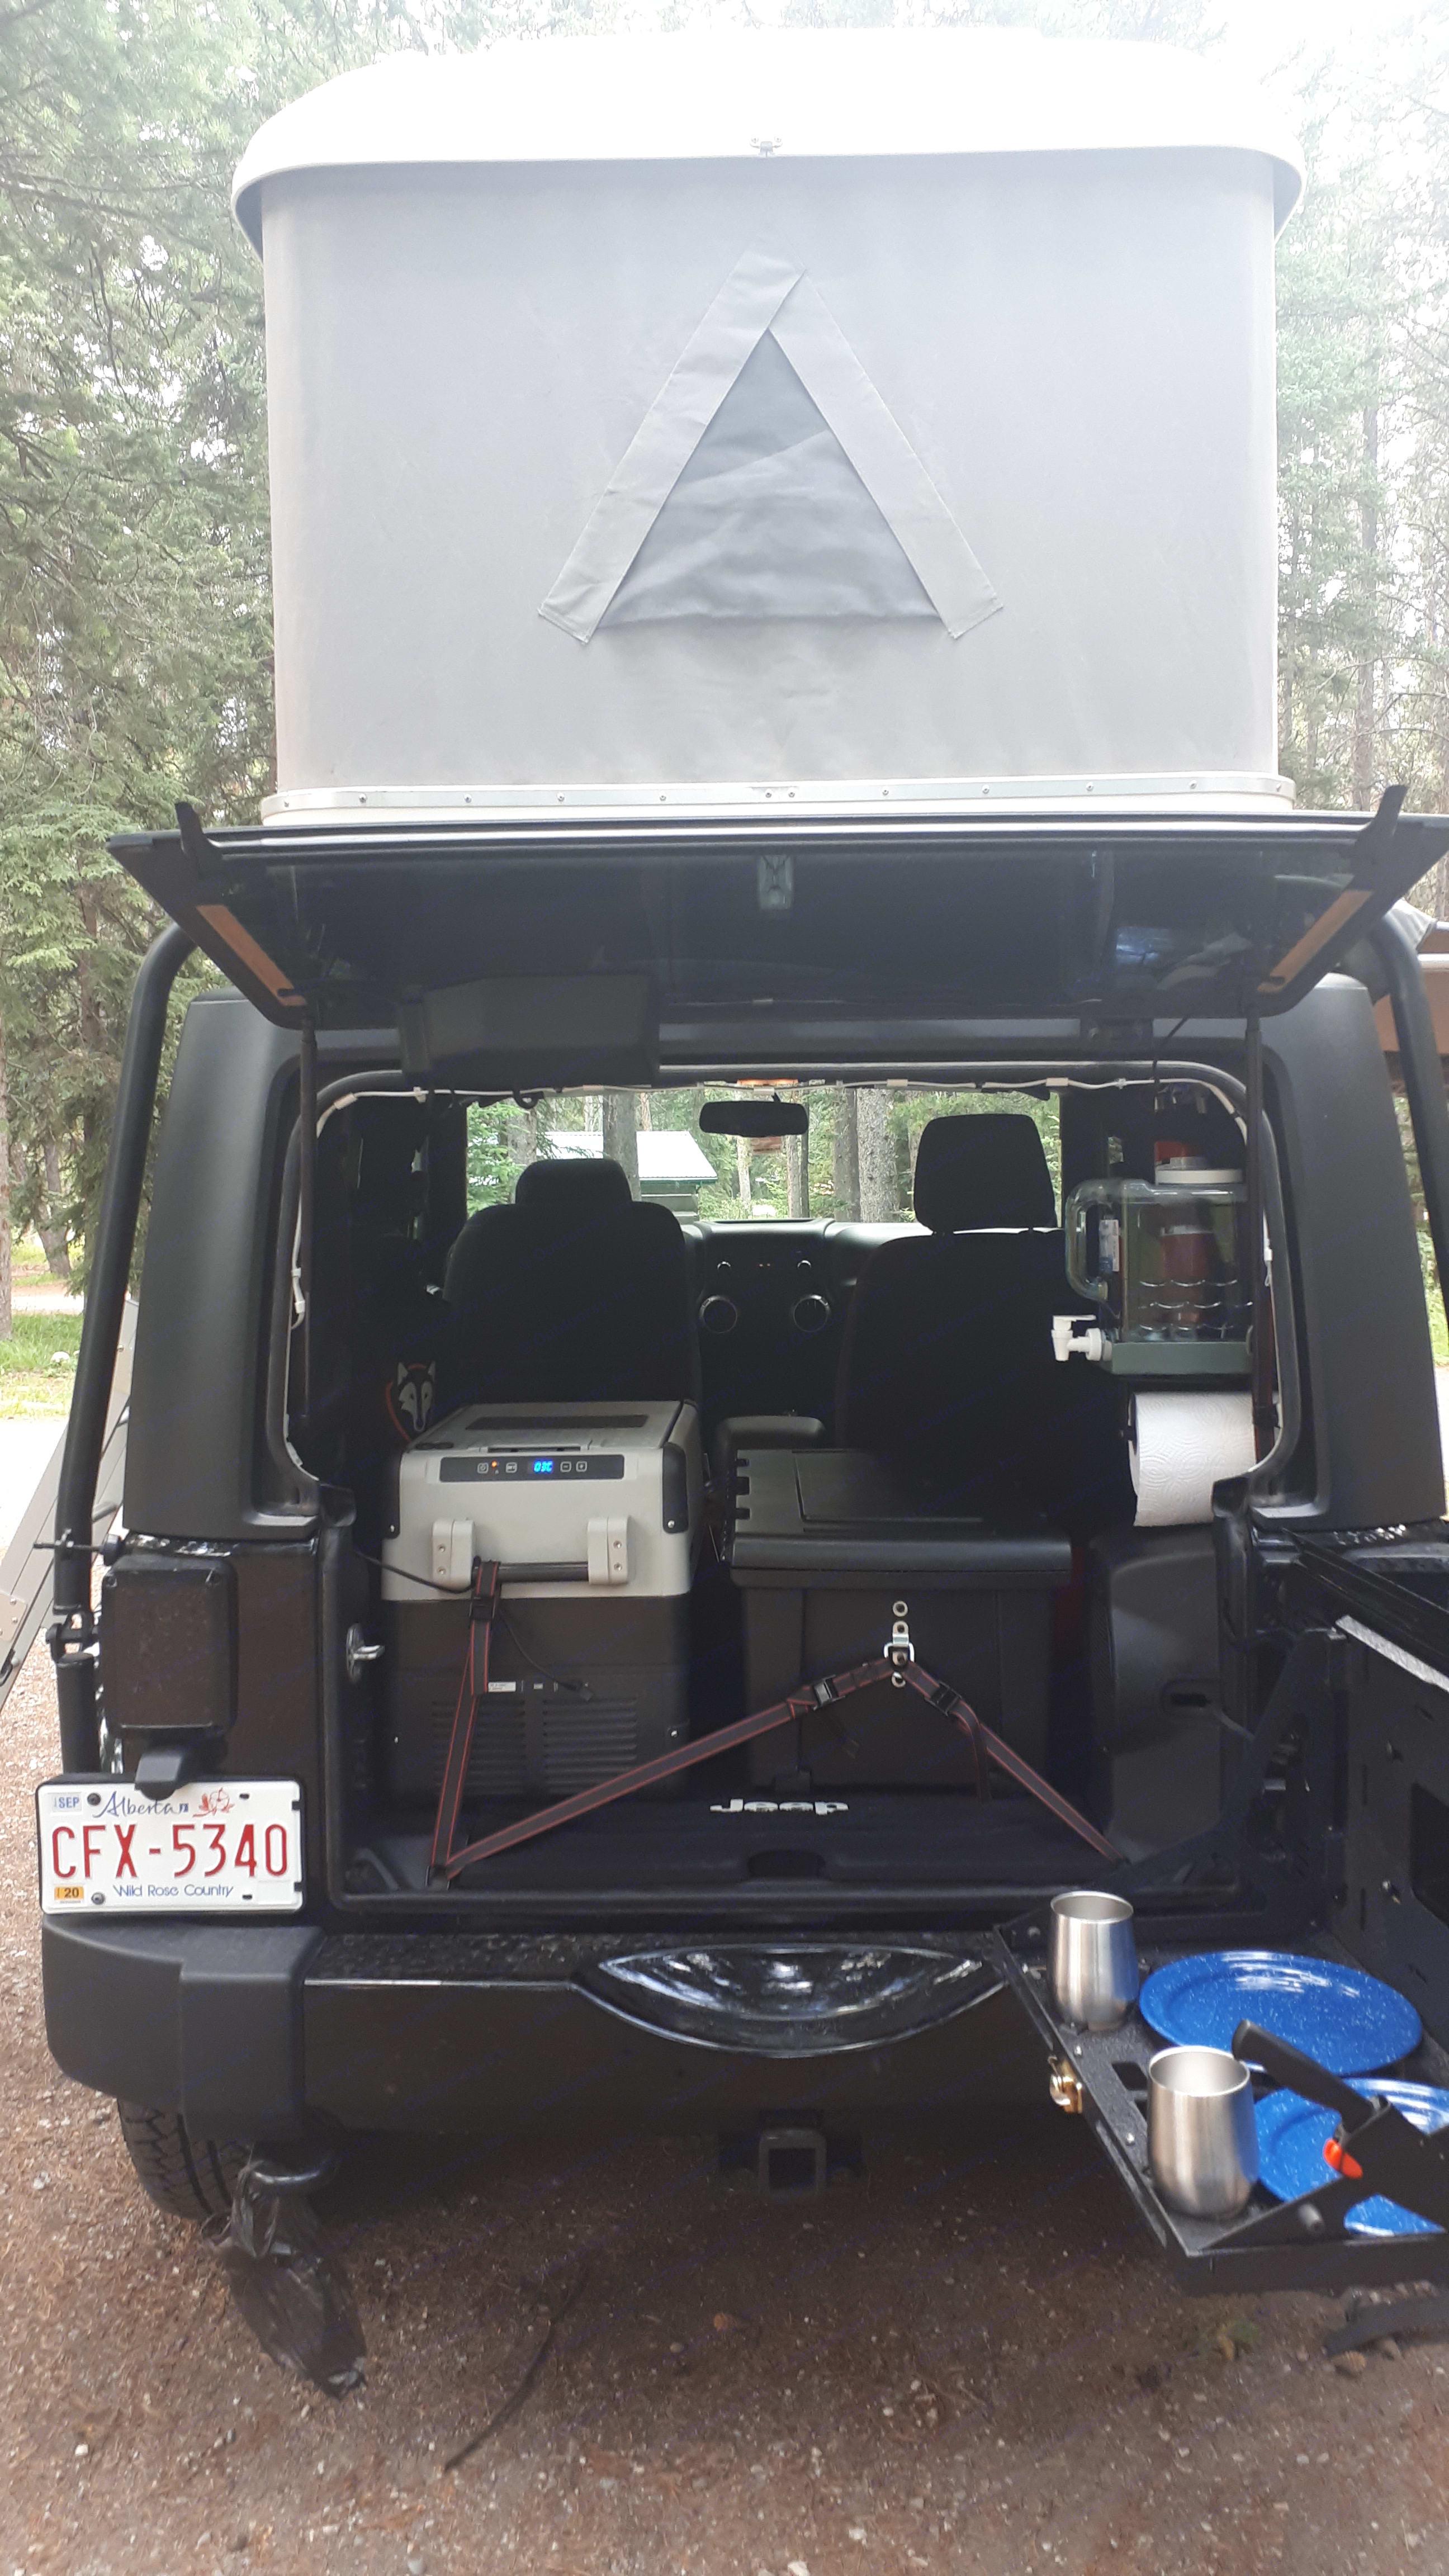 Rear kitchen area. Jeep Wrangler JK 2013